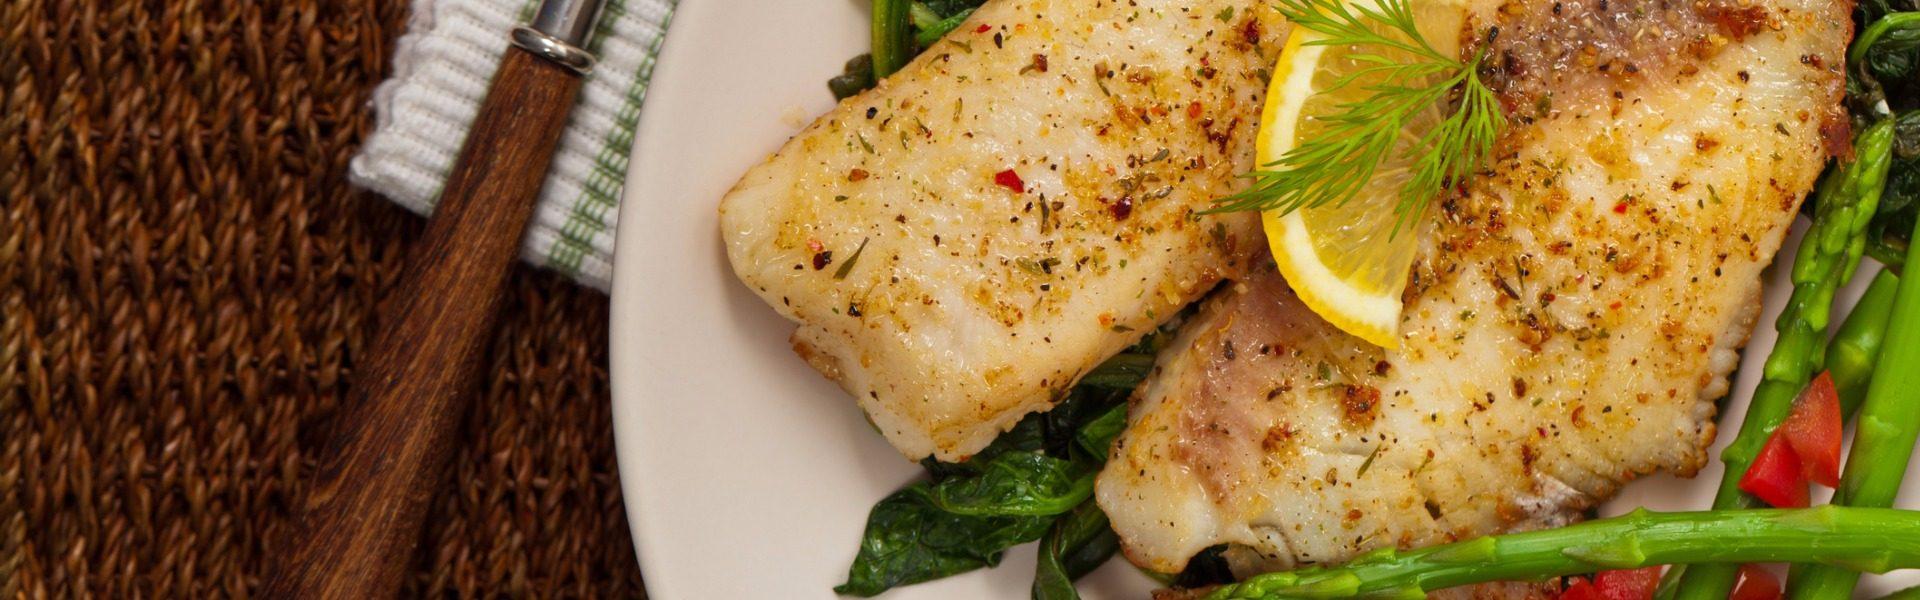 baked salmon and tilapia recipe _ mercy health